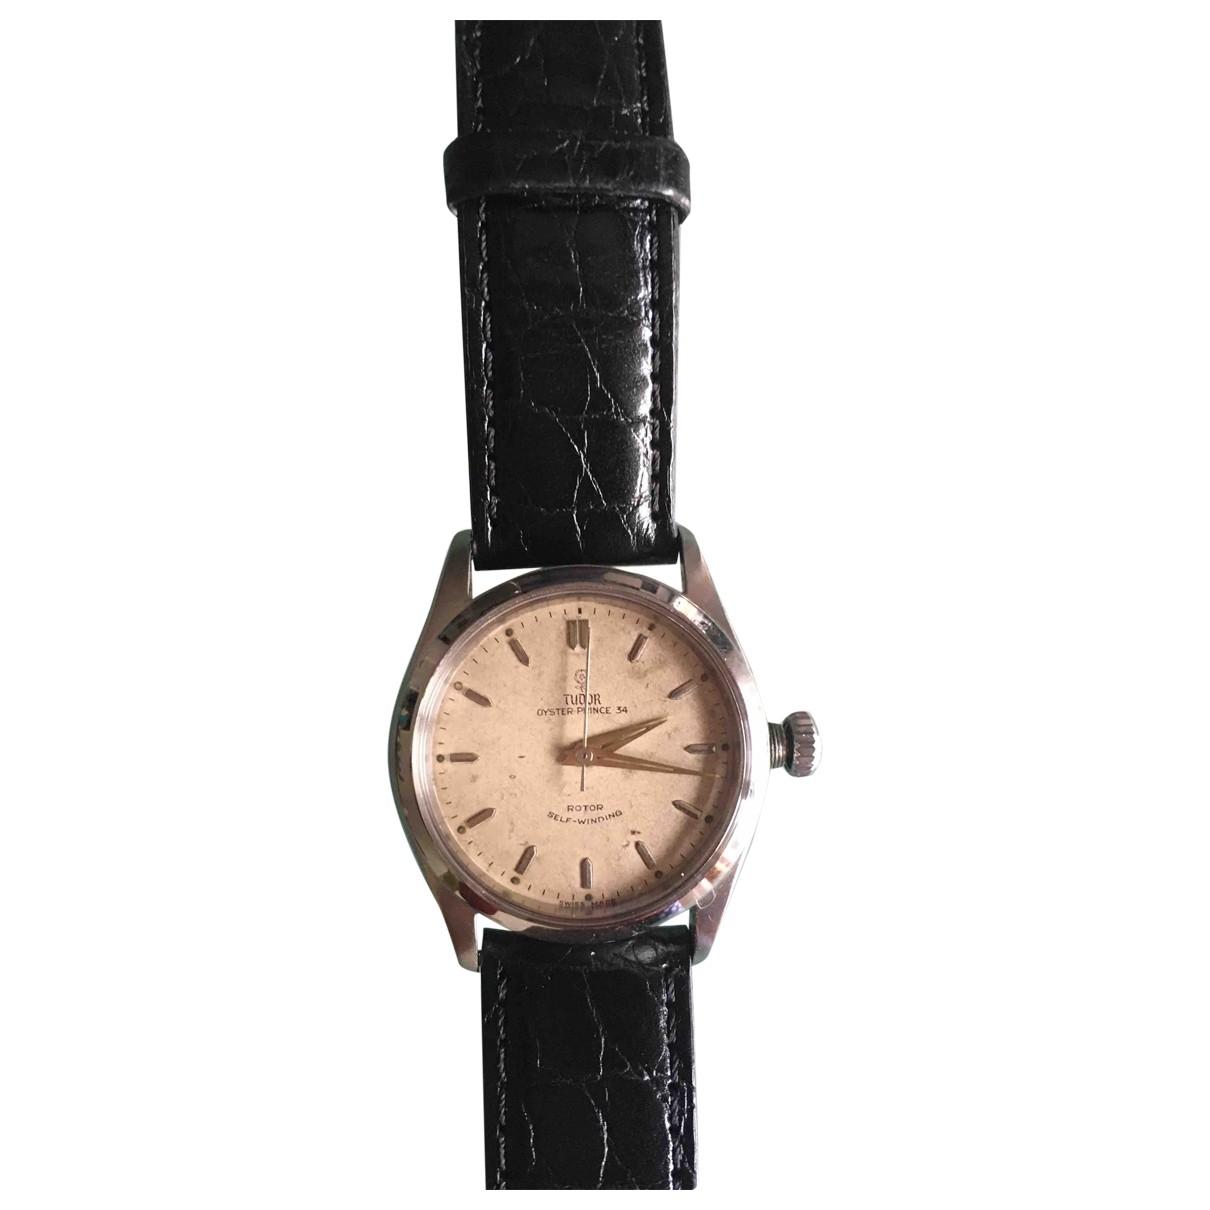 Relojes Oyster Tudor